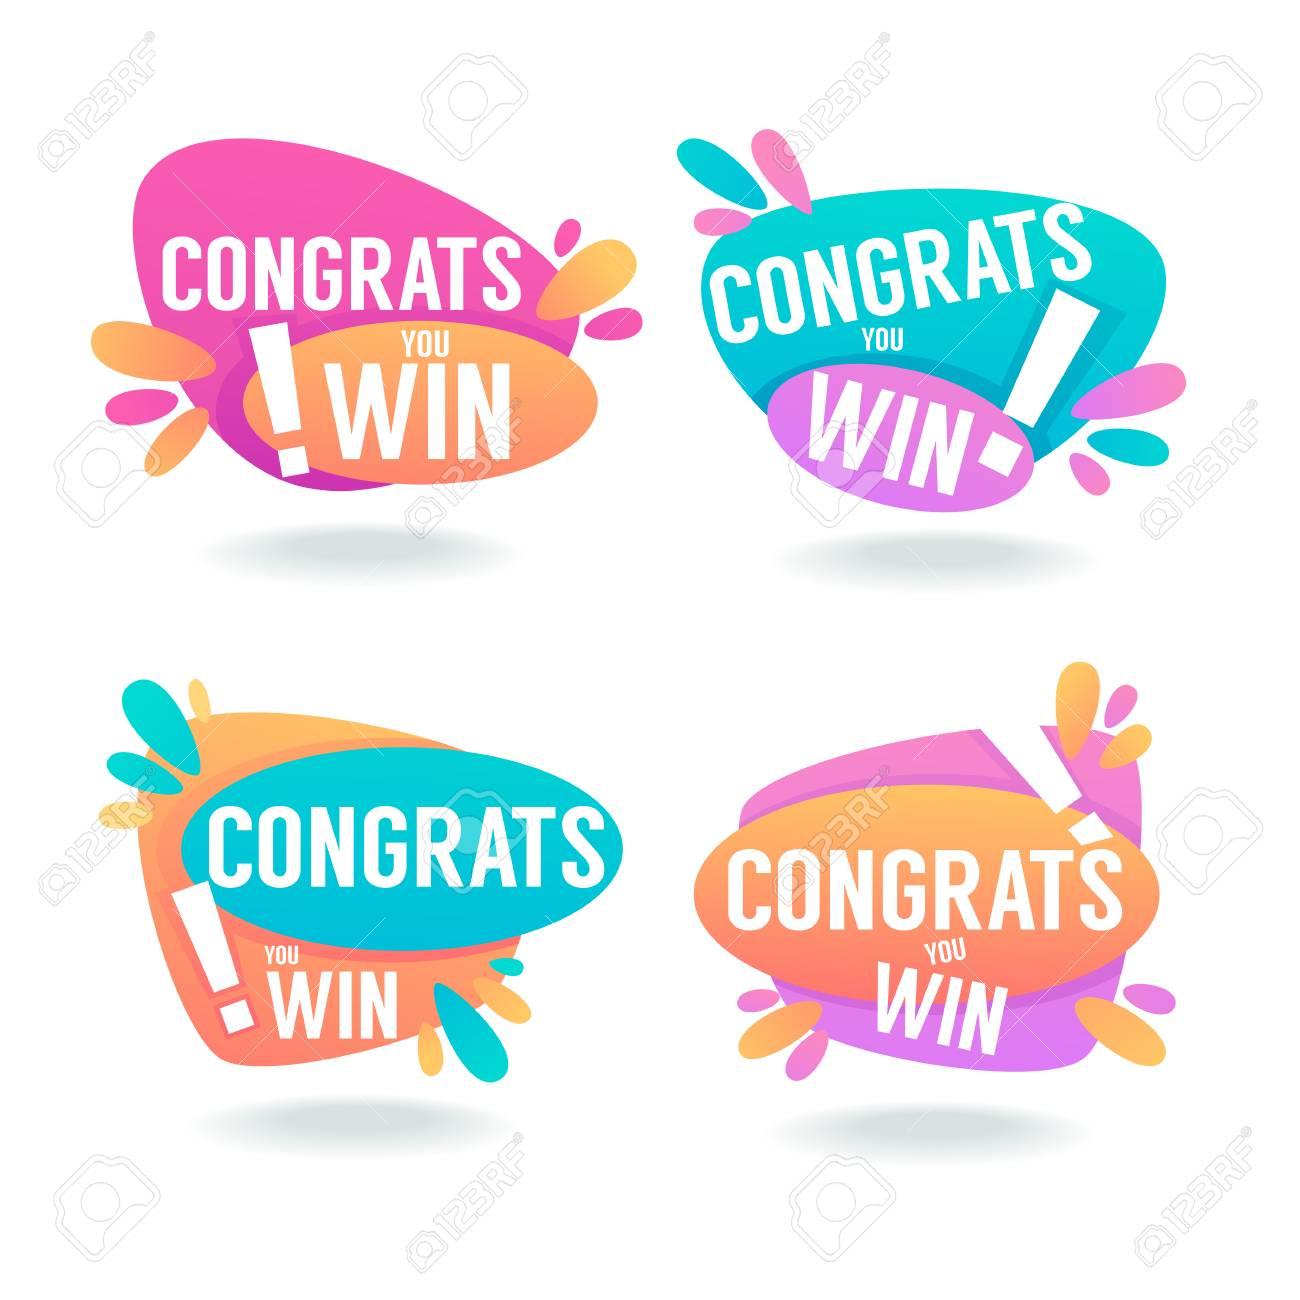 congrats you win vector congratulation banners and bubbles royalty